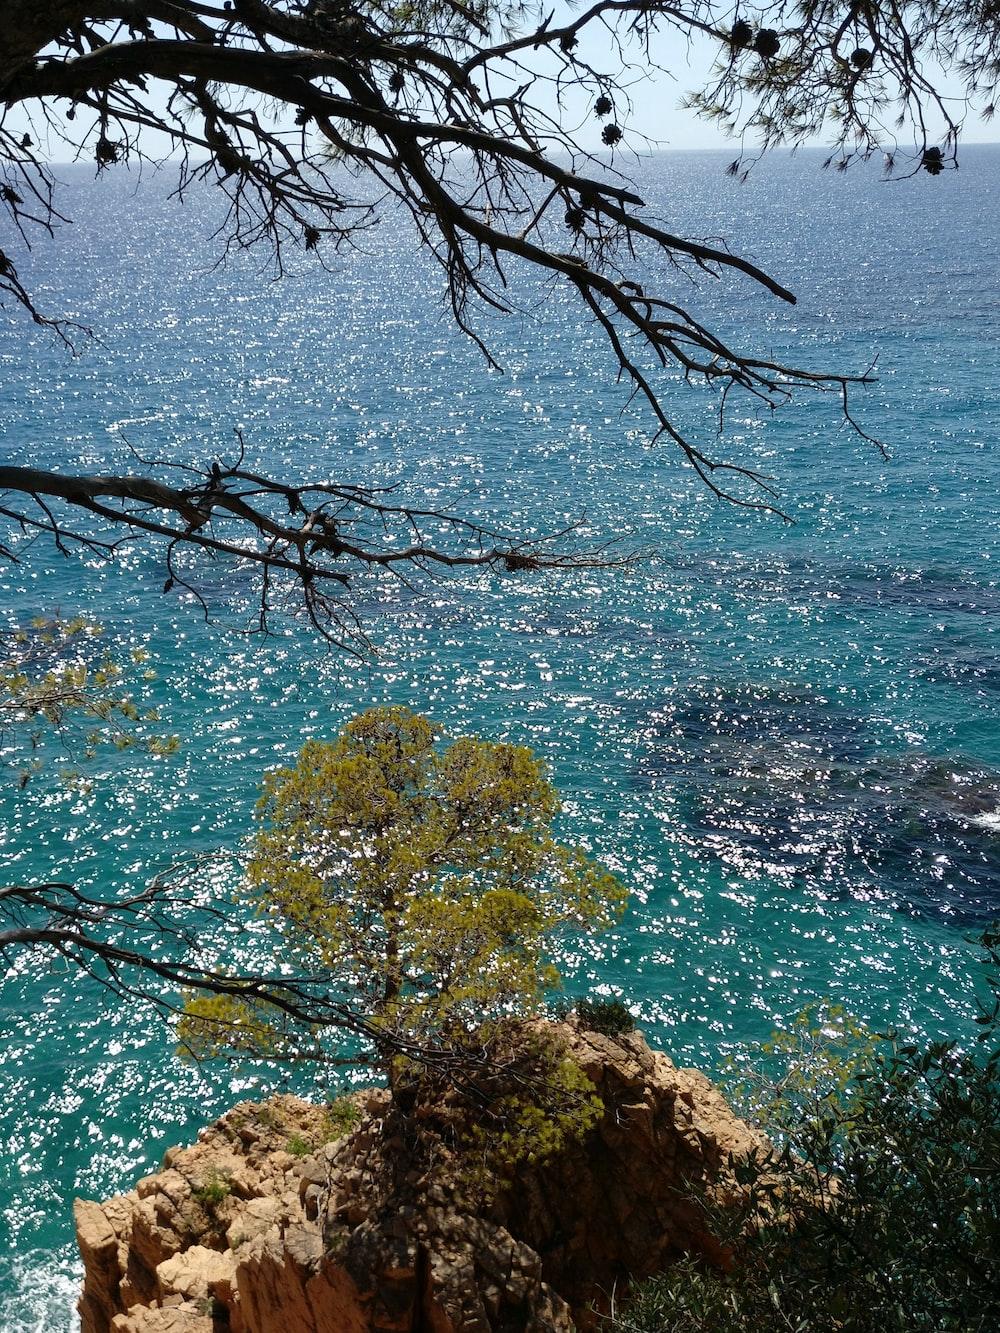 trees near body of water